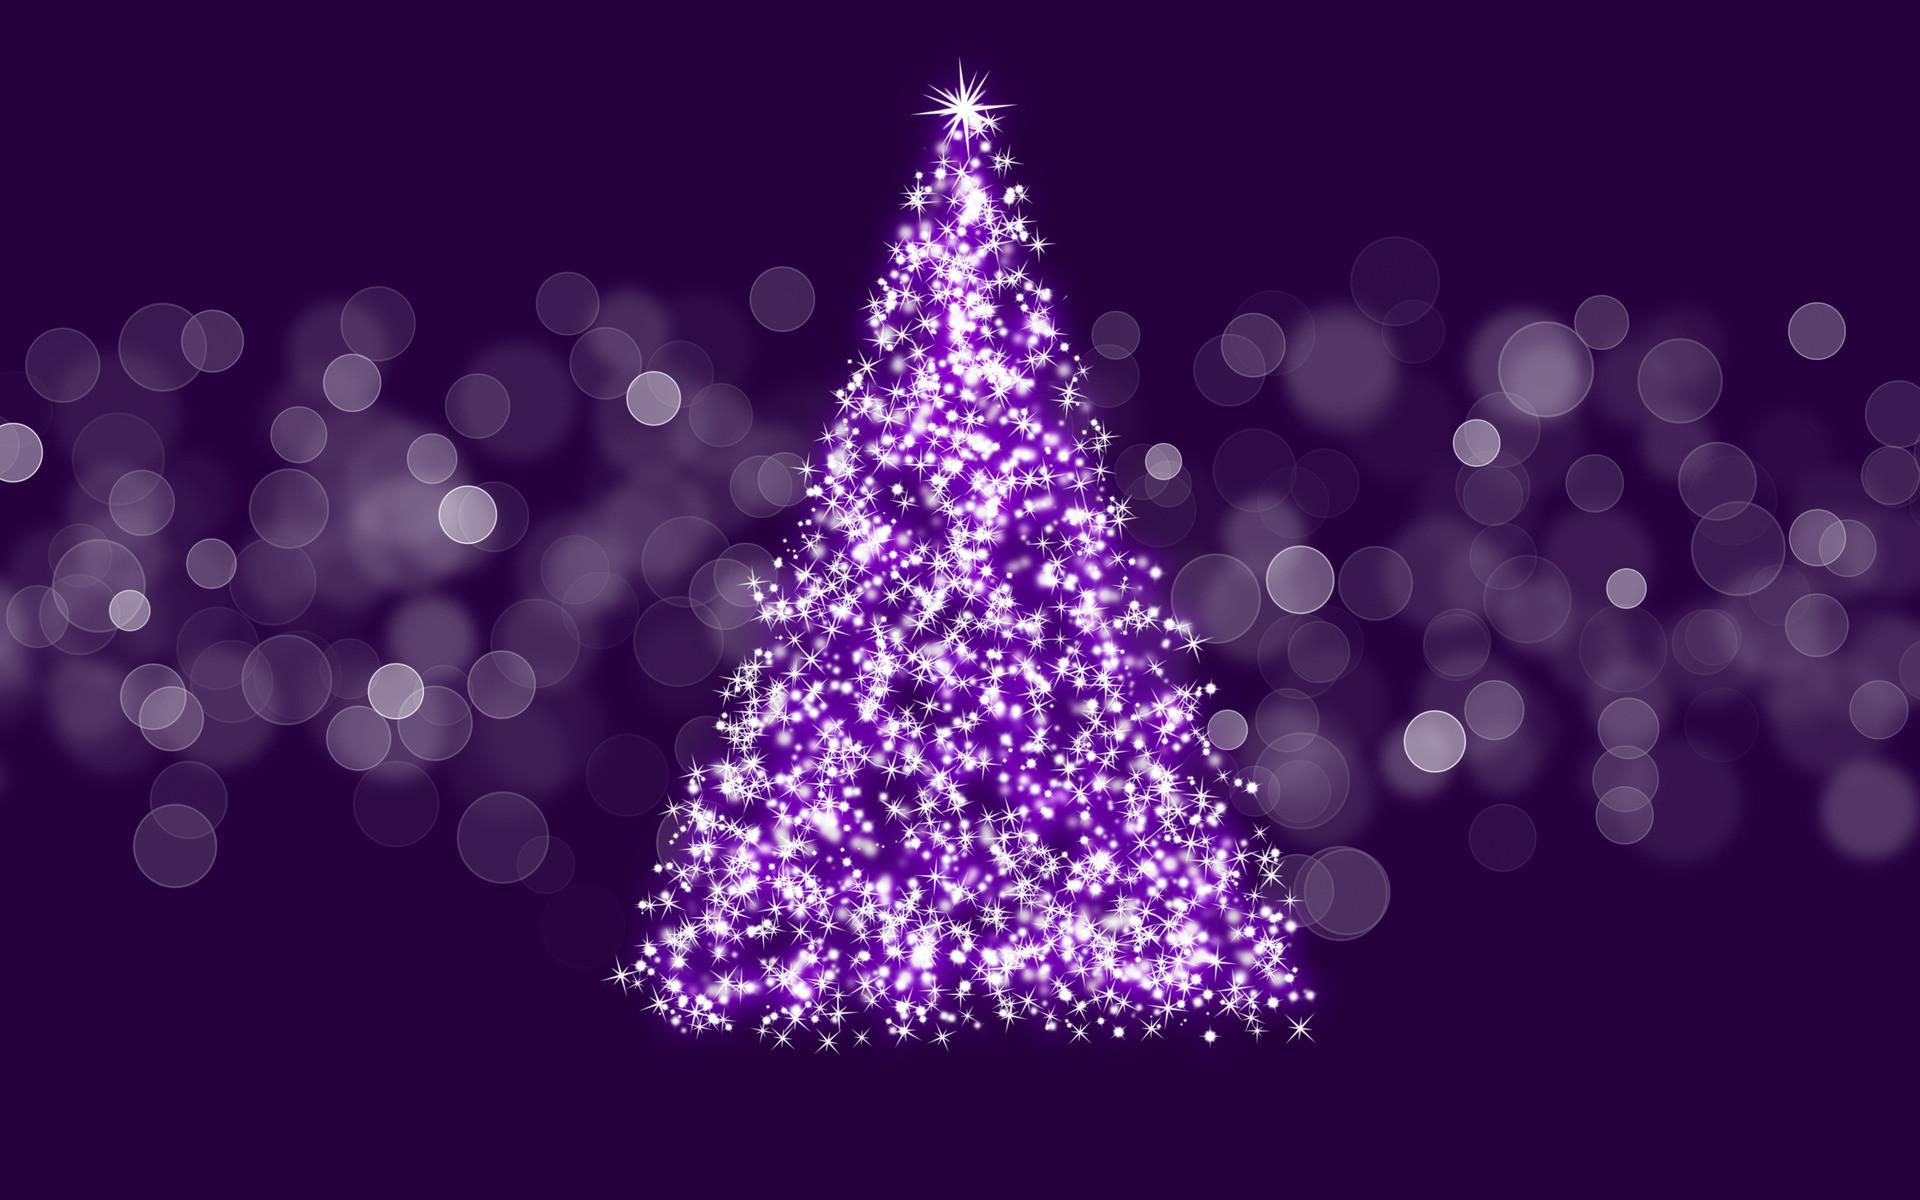 Desktop Wallpaper Sparkling Christmas – WallpaperSafari